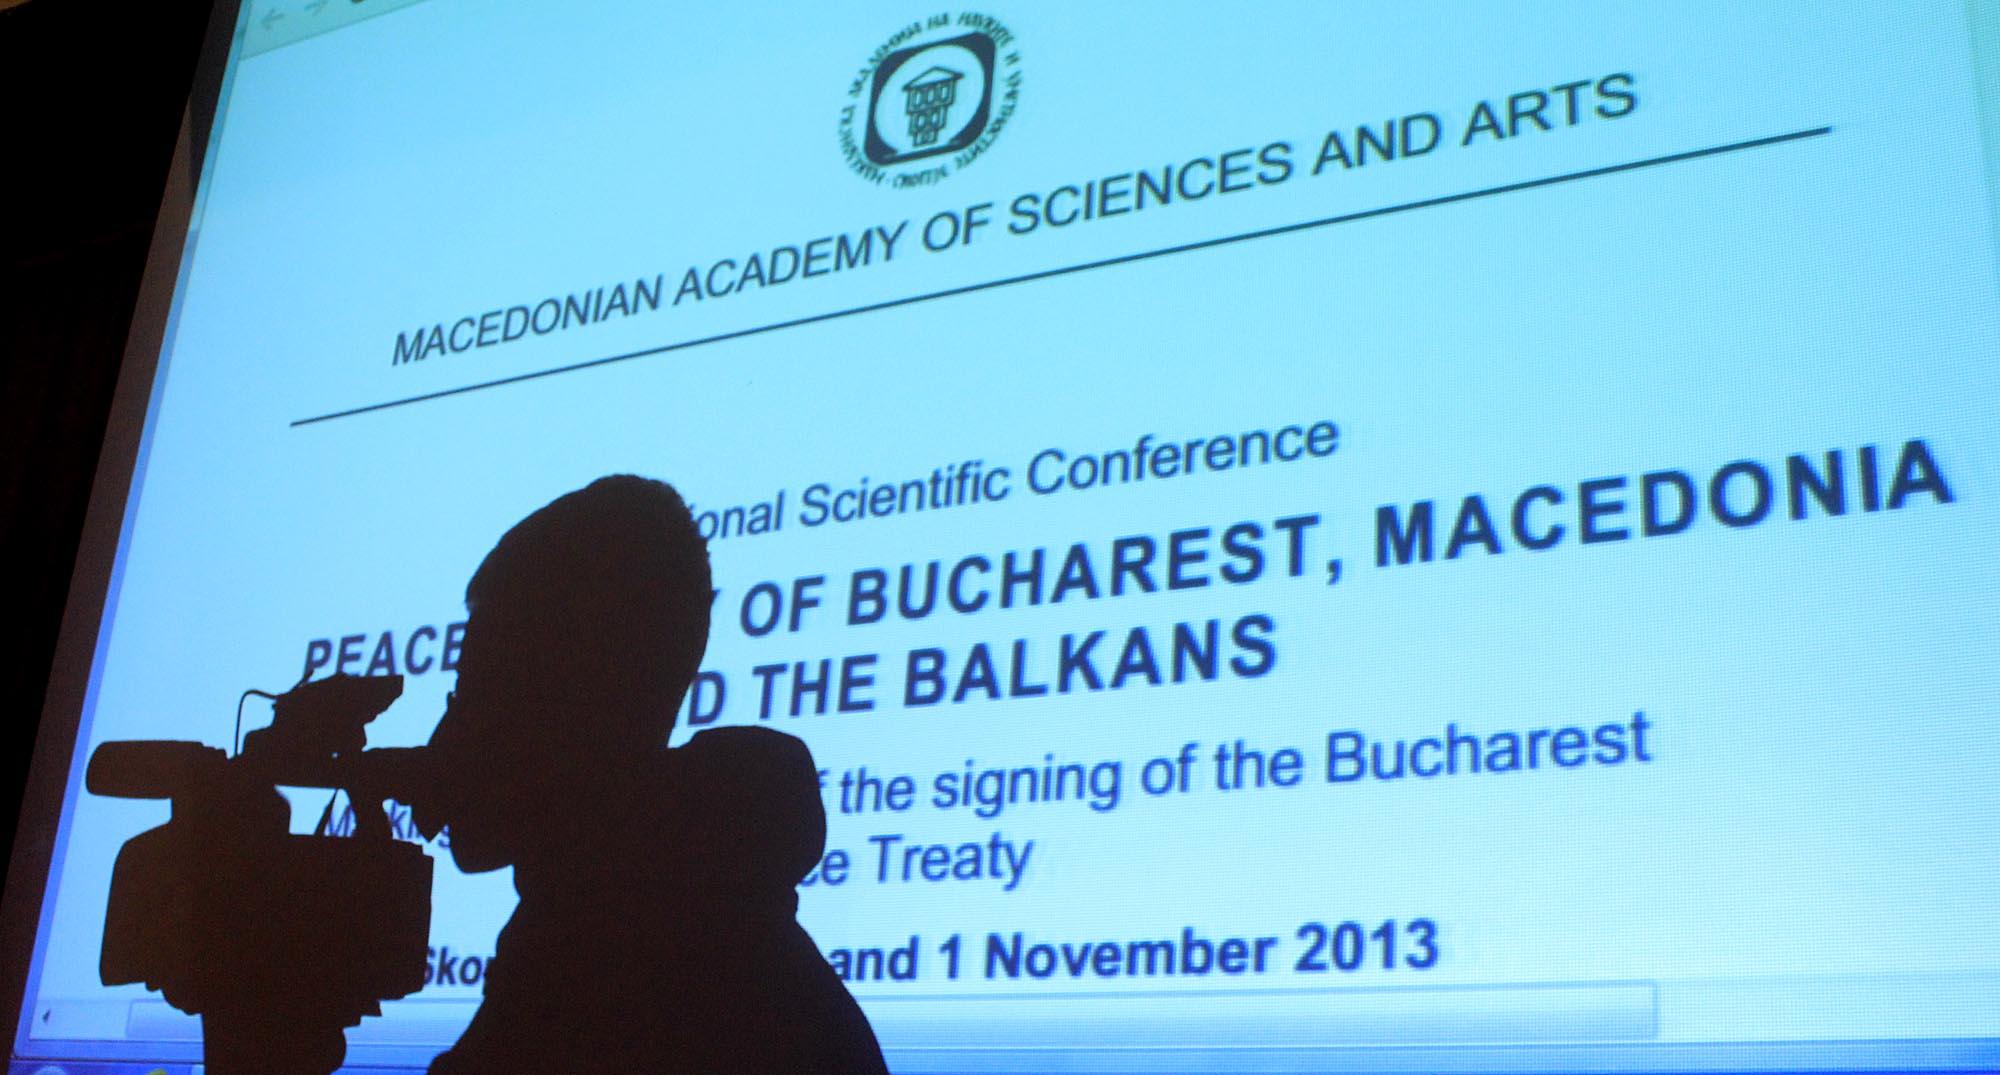 Academics in FYROM blame international historical conferences